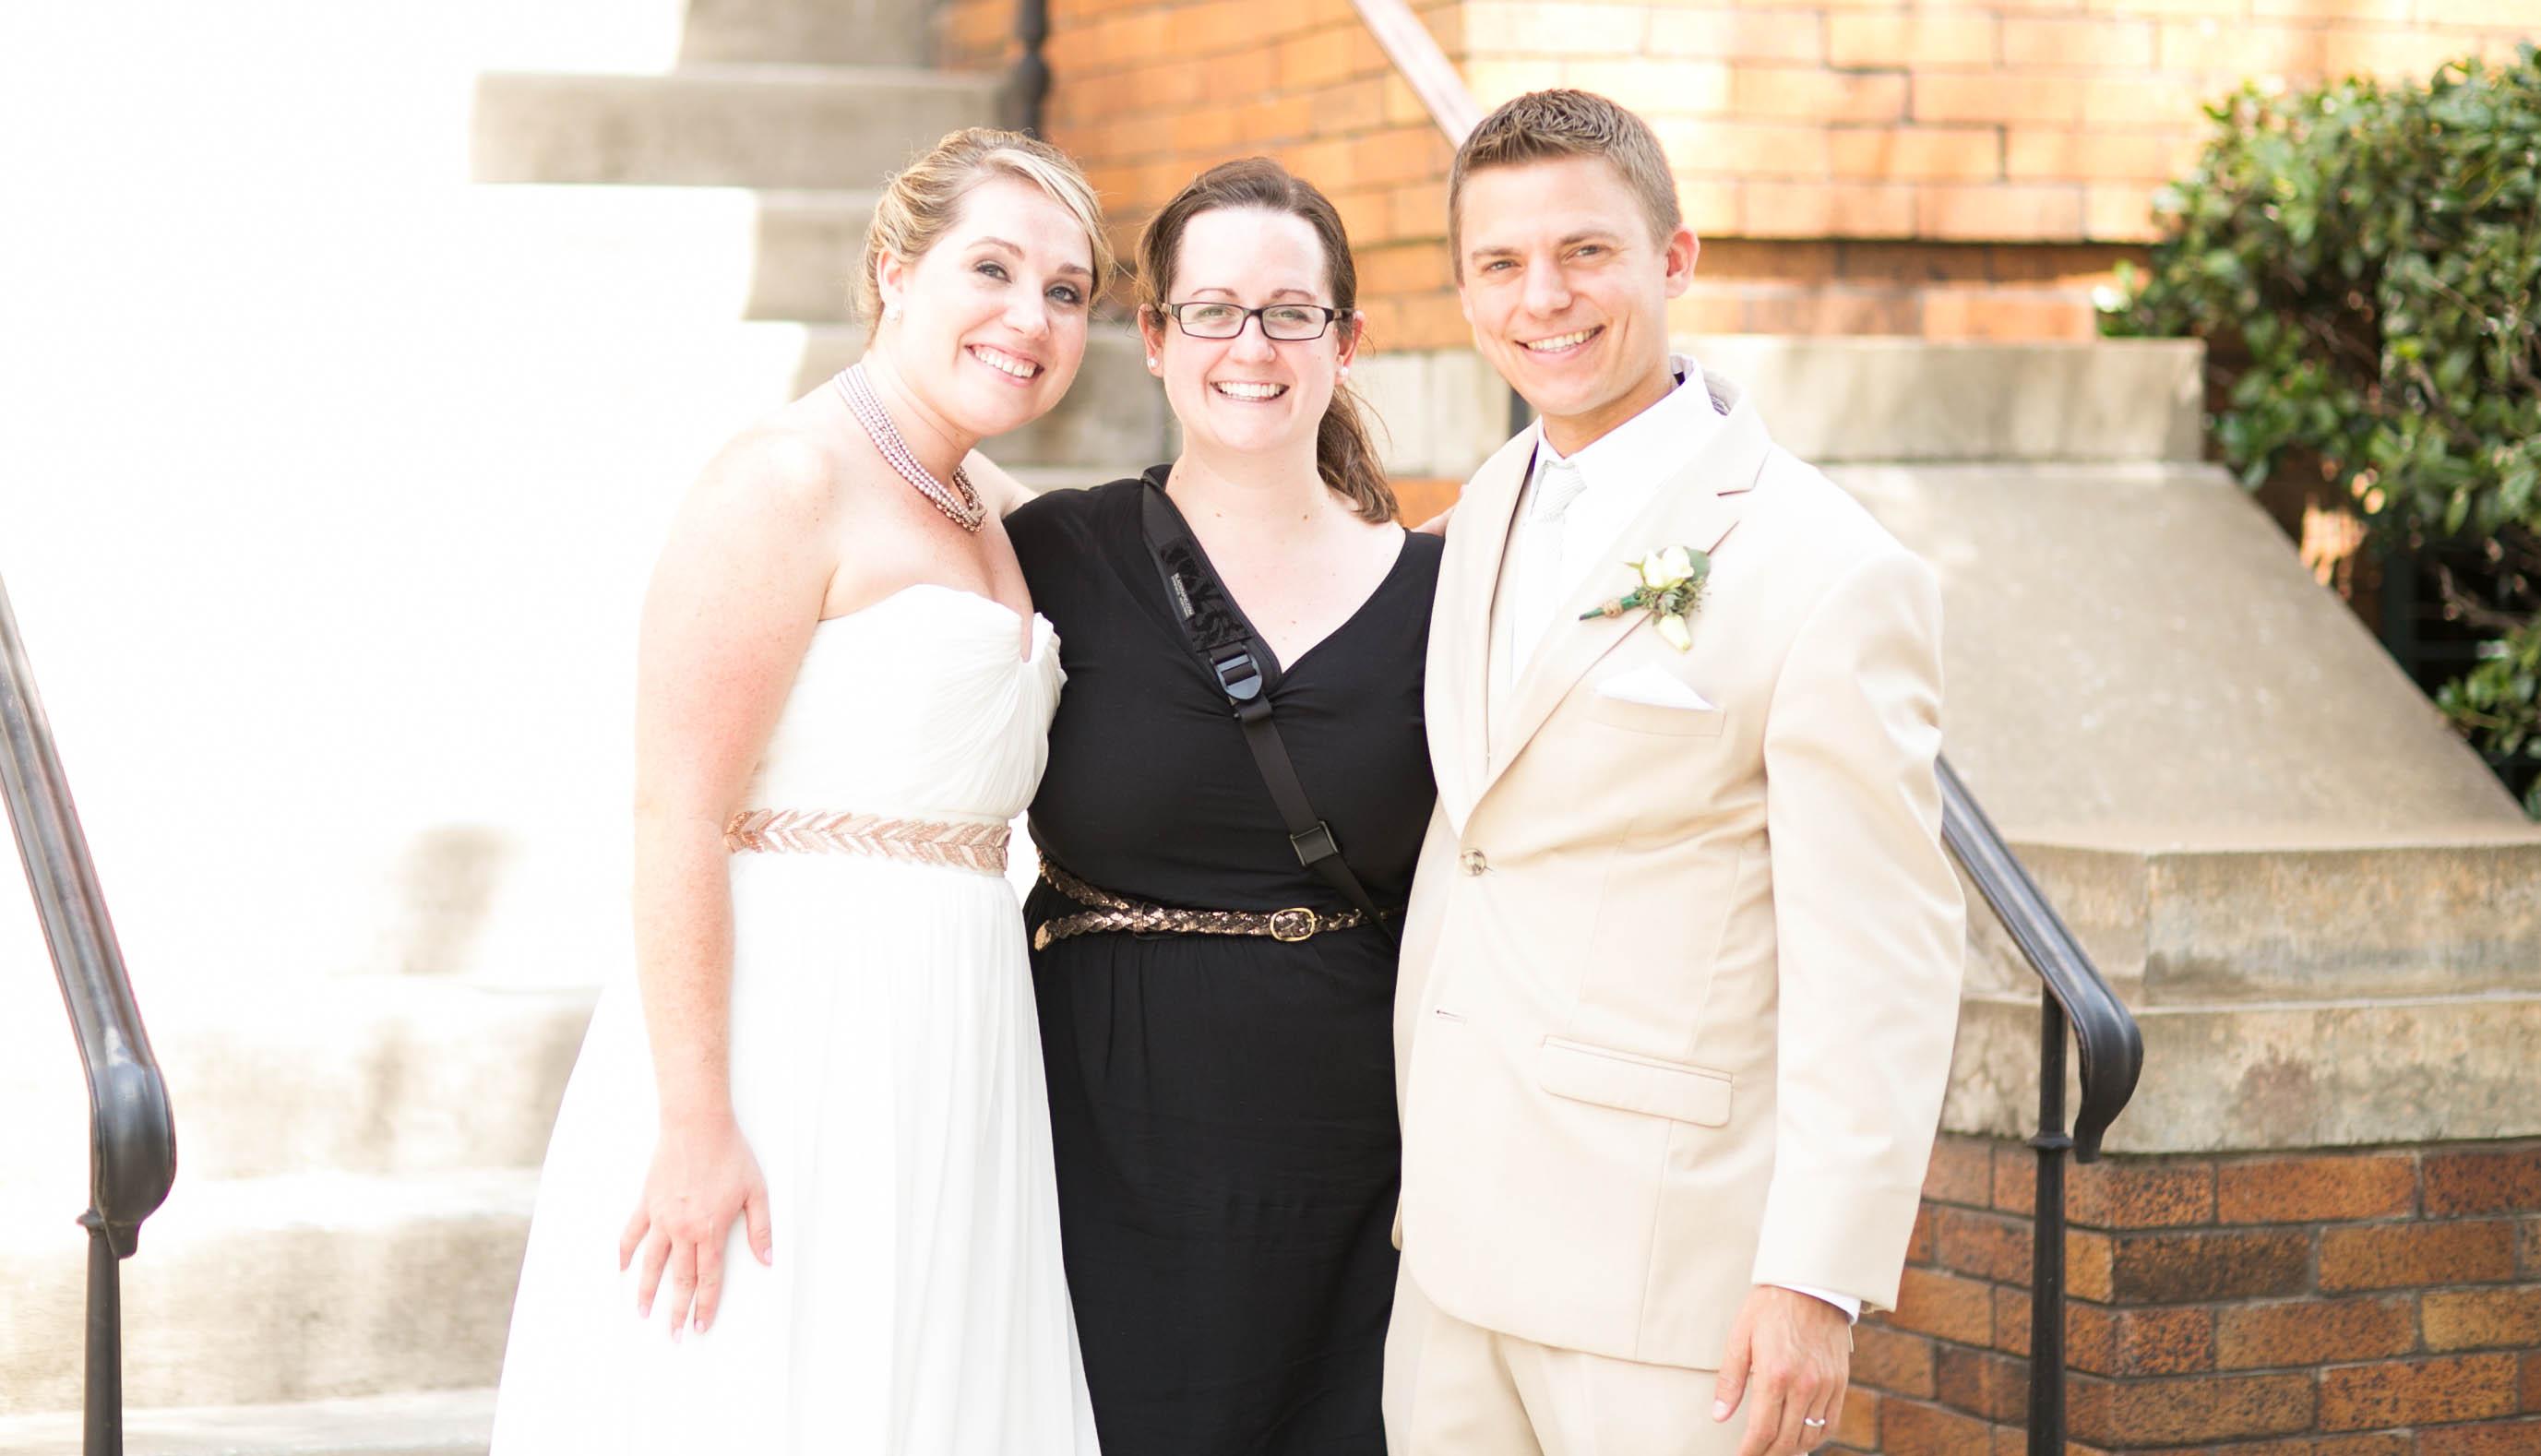 Becca and Tom Wedding 2-183-2